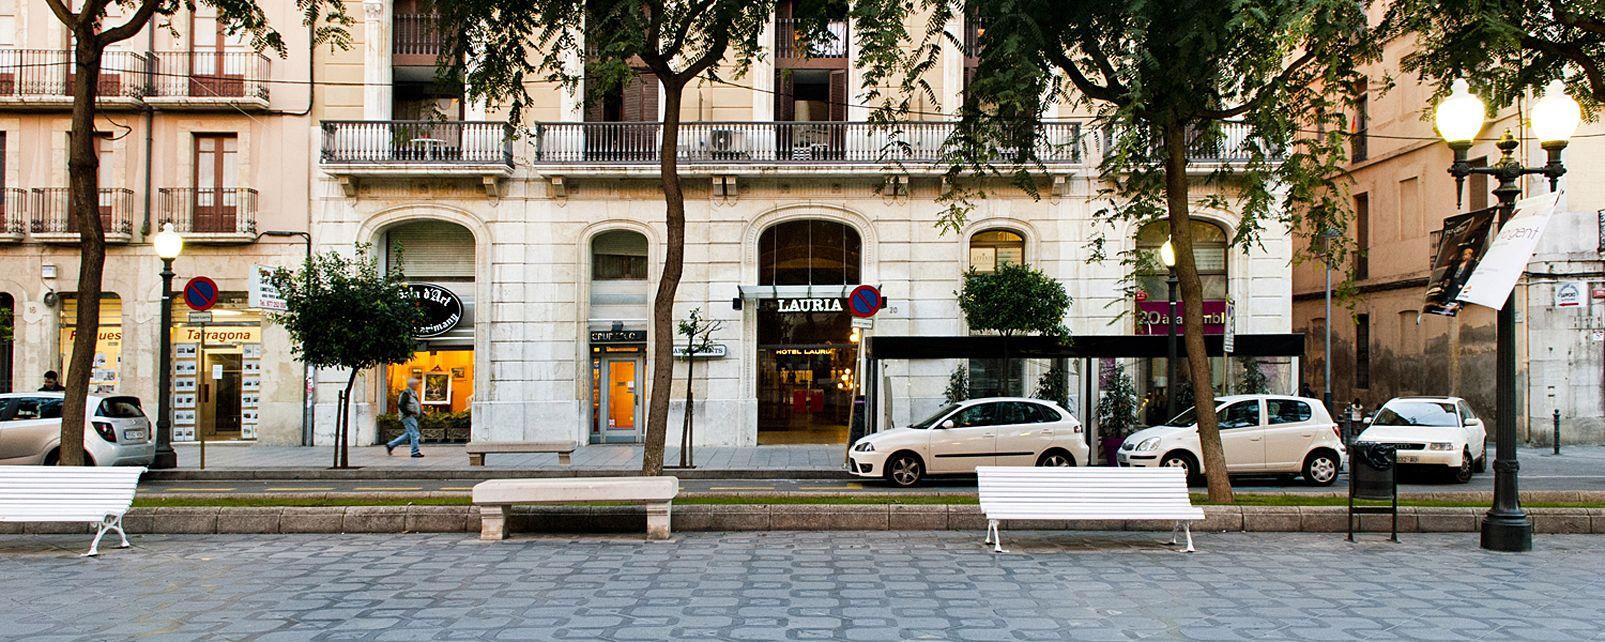 Hôtel Lauria Hotel